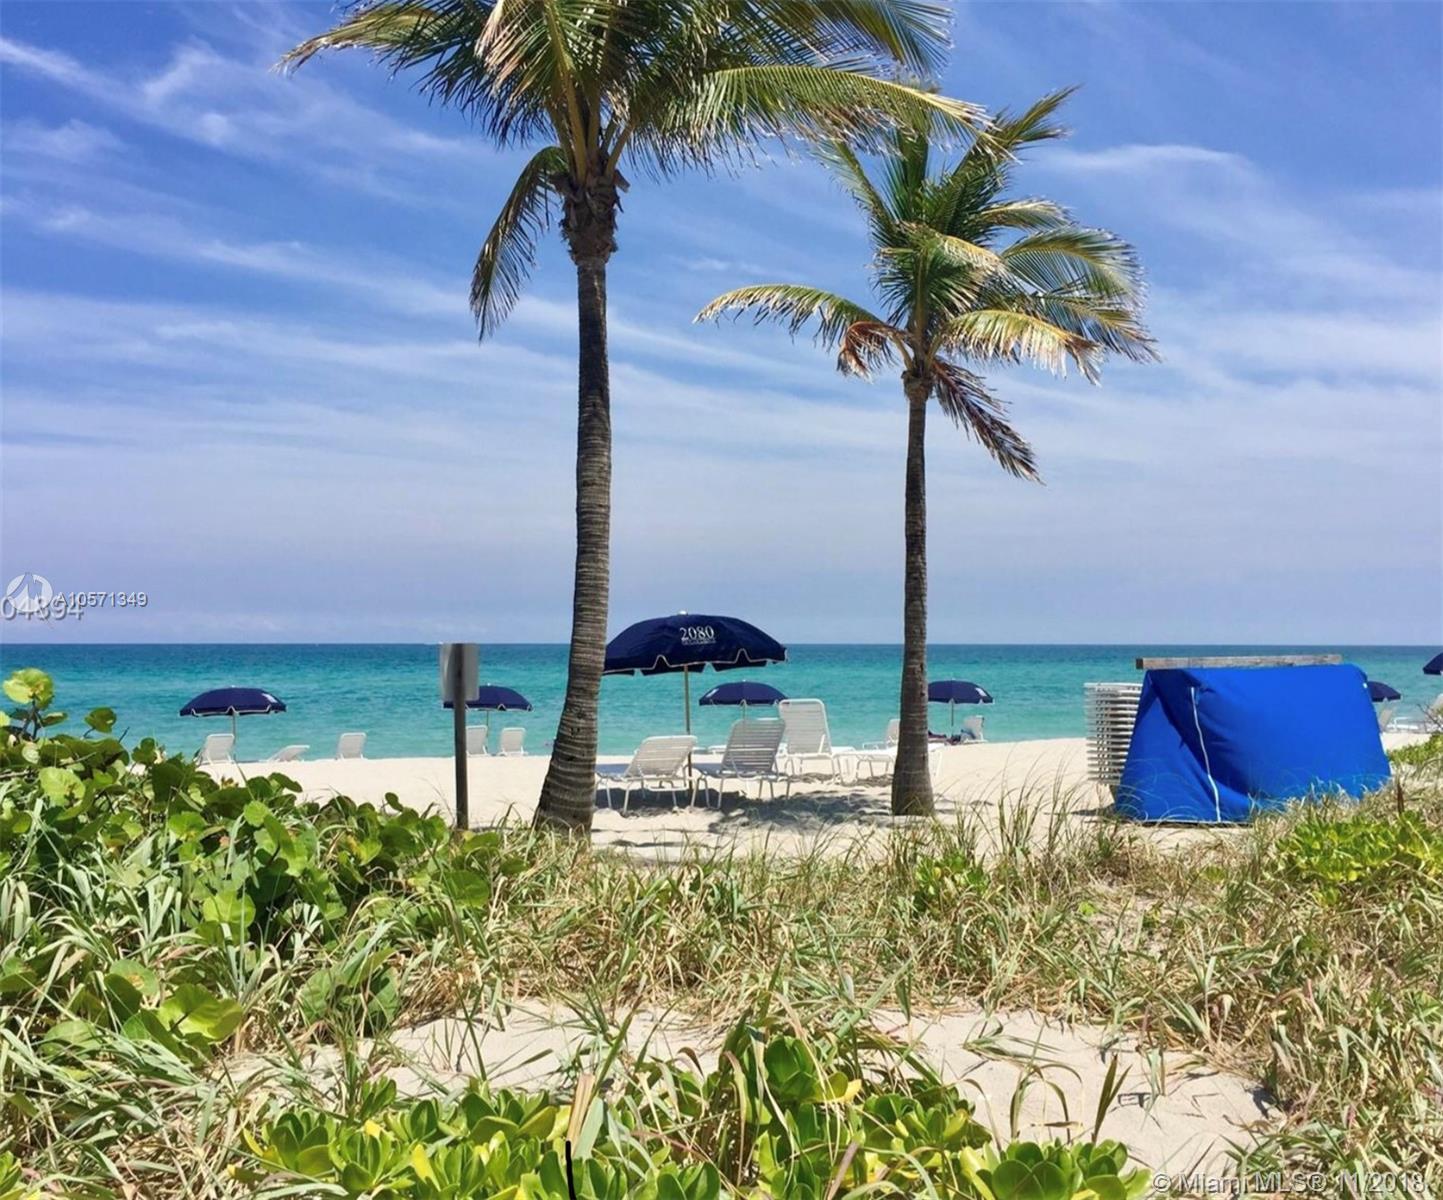 2080 S Ocean Dr # 1104, Hallandale Beach, Florida 33009, 2 Bedrooms Bedrooms, ,2 BathroomsBathrooms,Residential Lease,For Rent,2080 S Ocean Dr # 1104,A10571349